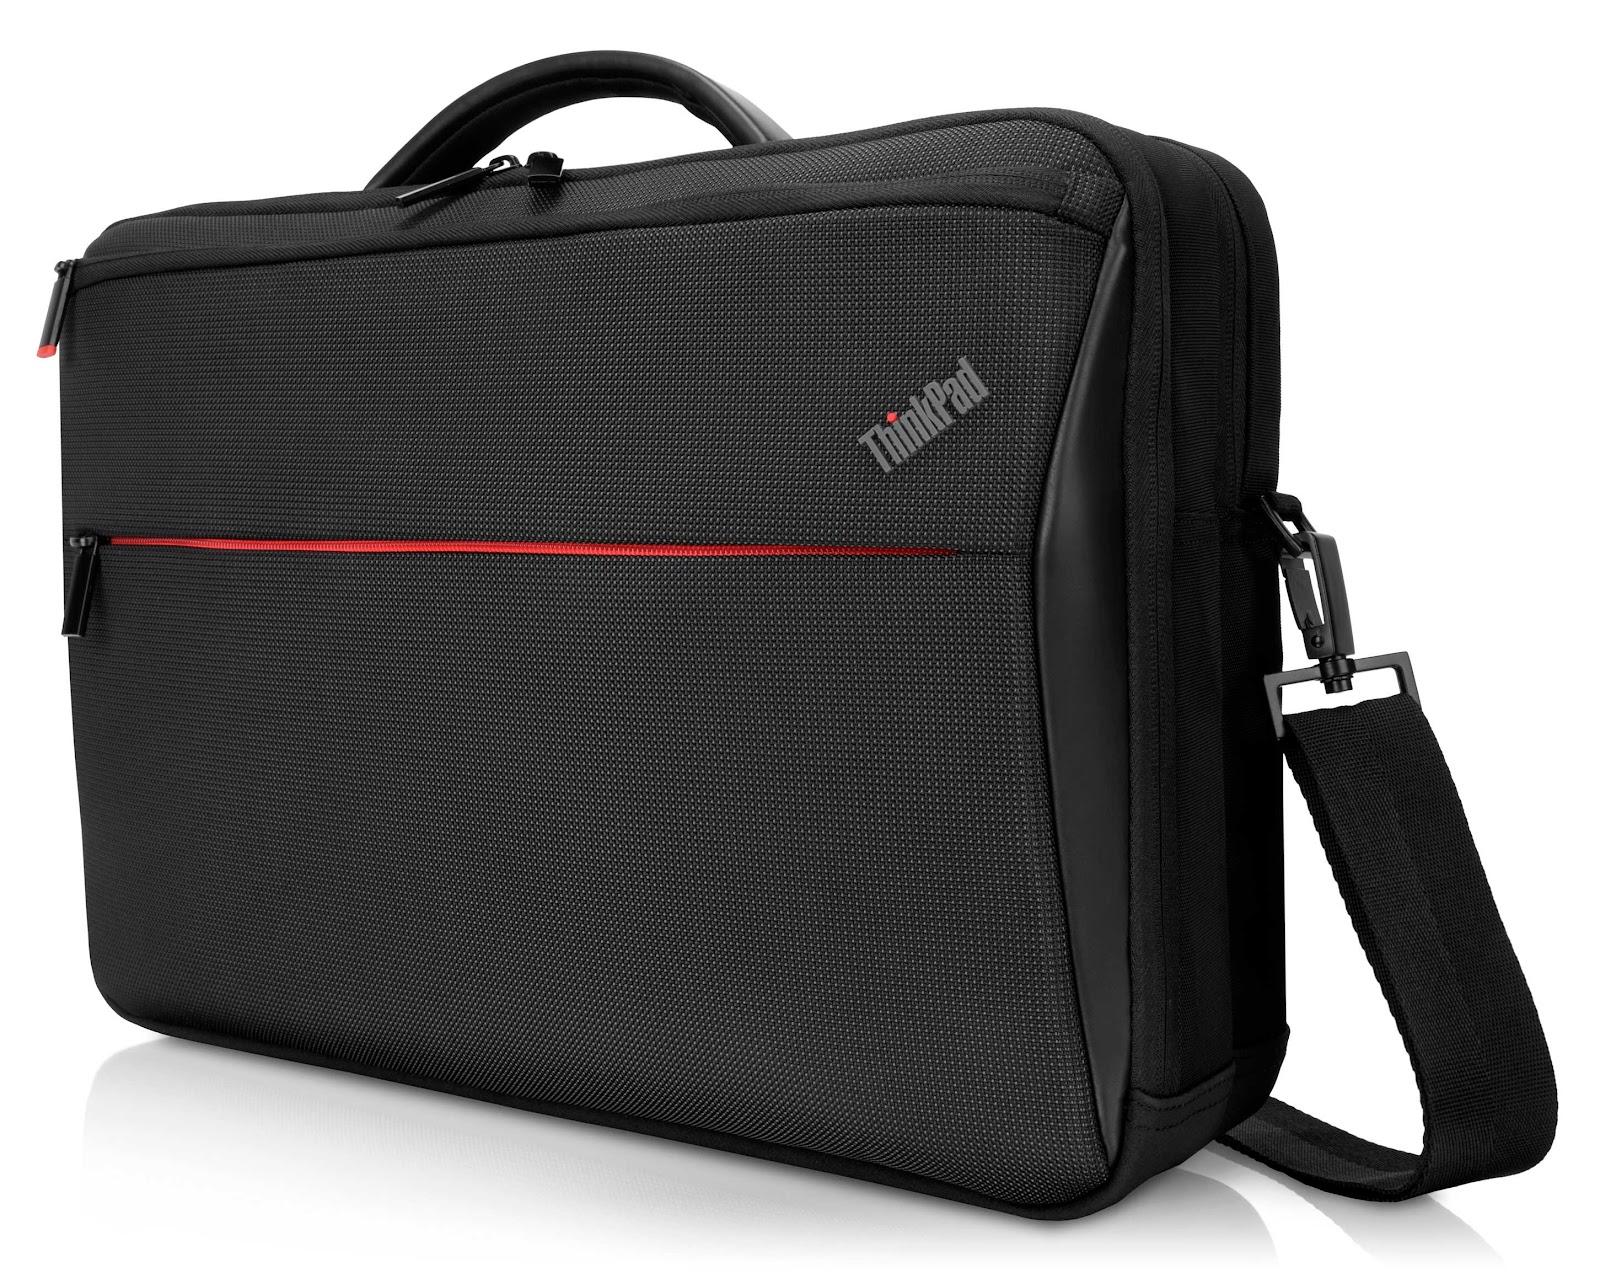 Фото 1. Сумка Lenovo ThinkPad Professional Slim Top-Load Black (4X40Q26385)